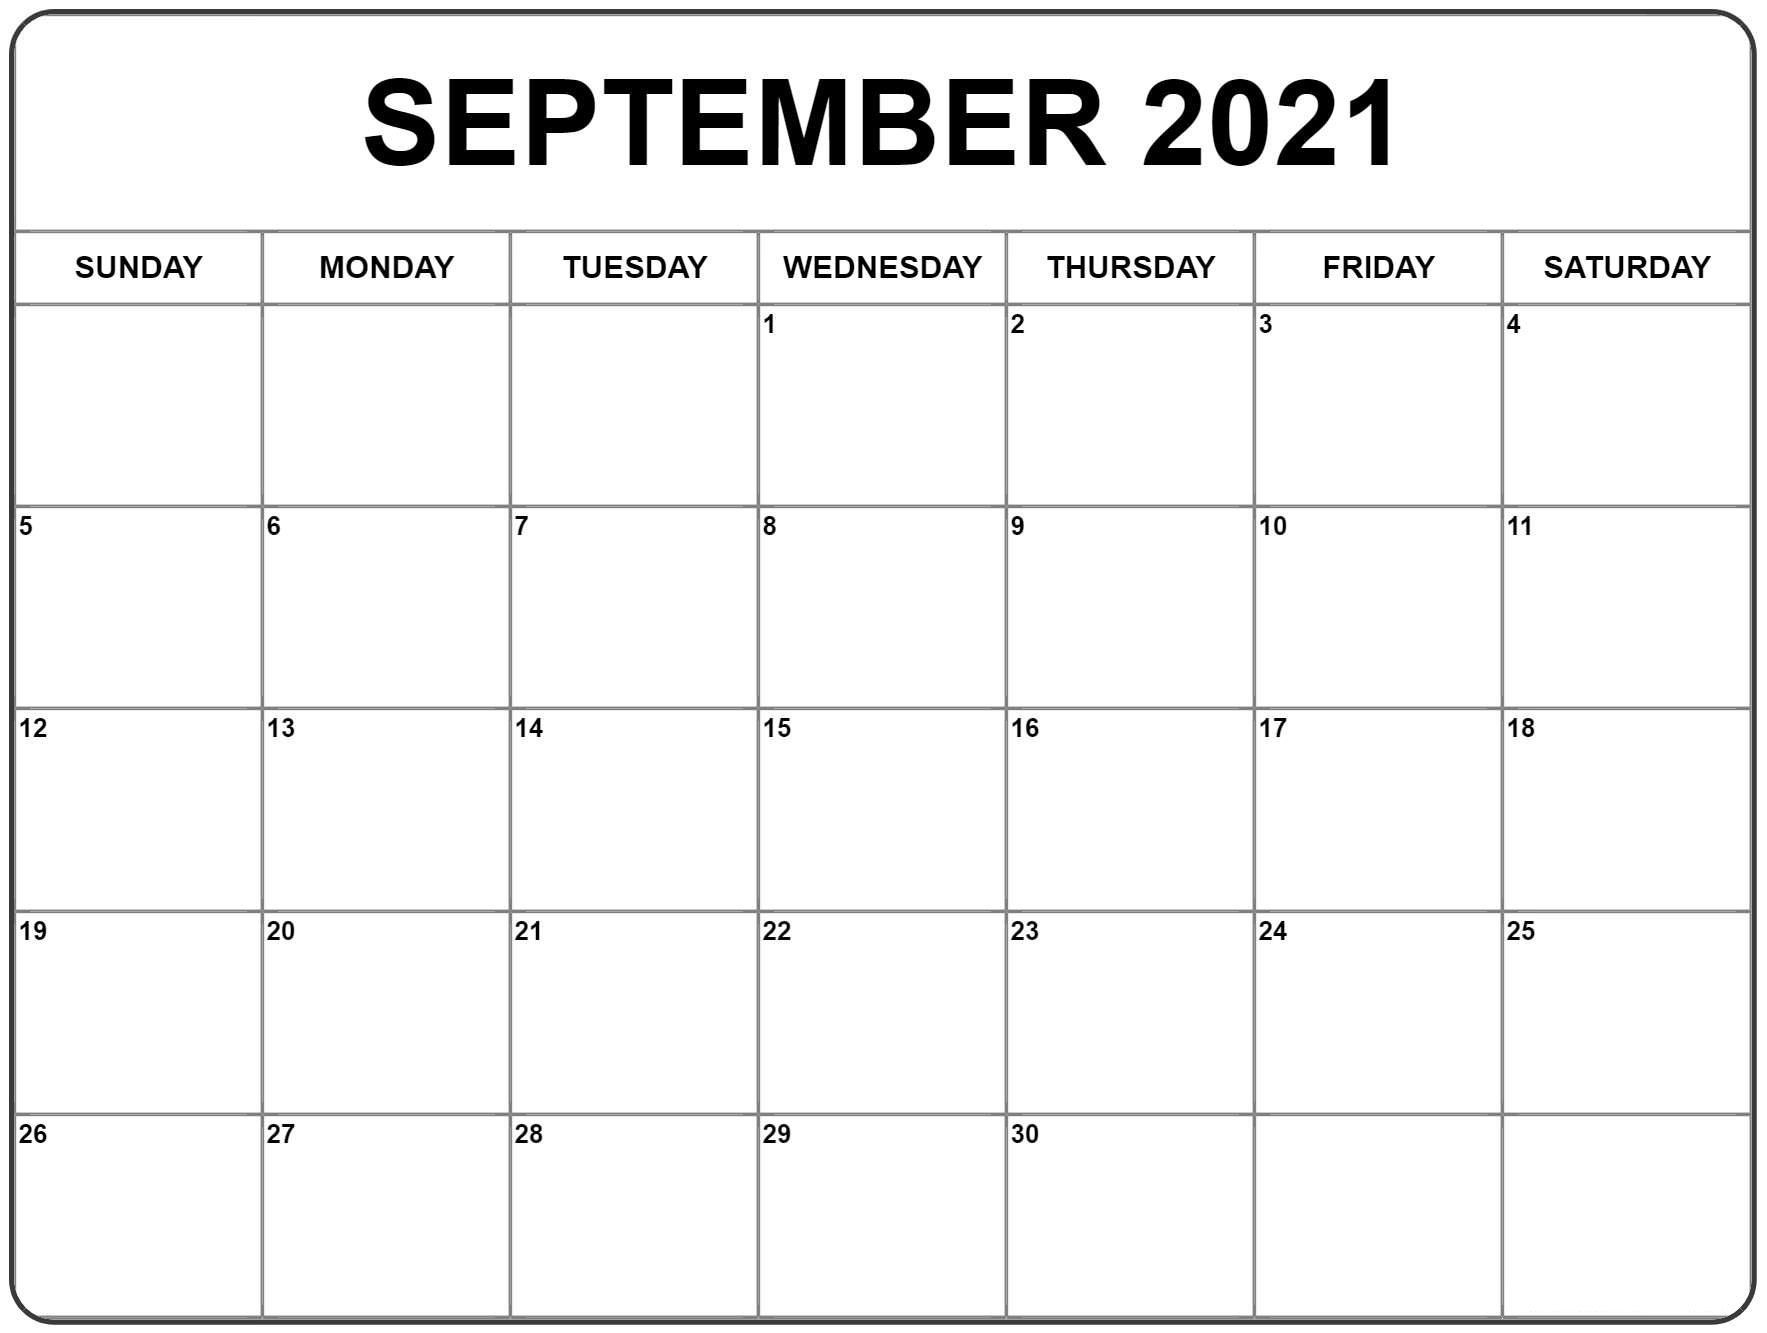 September 2021 Calendar   Blank Monthly Calendar Template-Free Printable Blank Monthly Calendar Year 2021